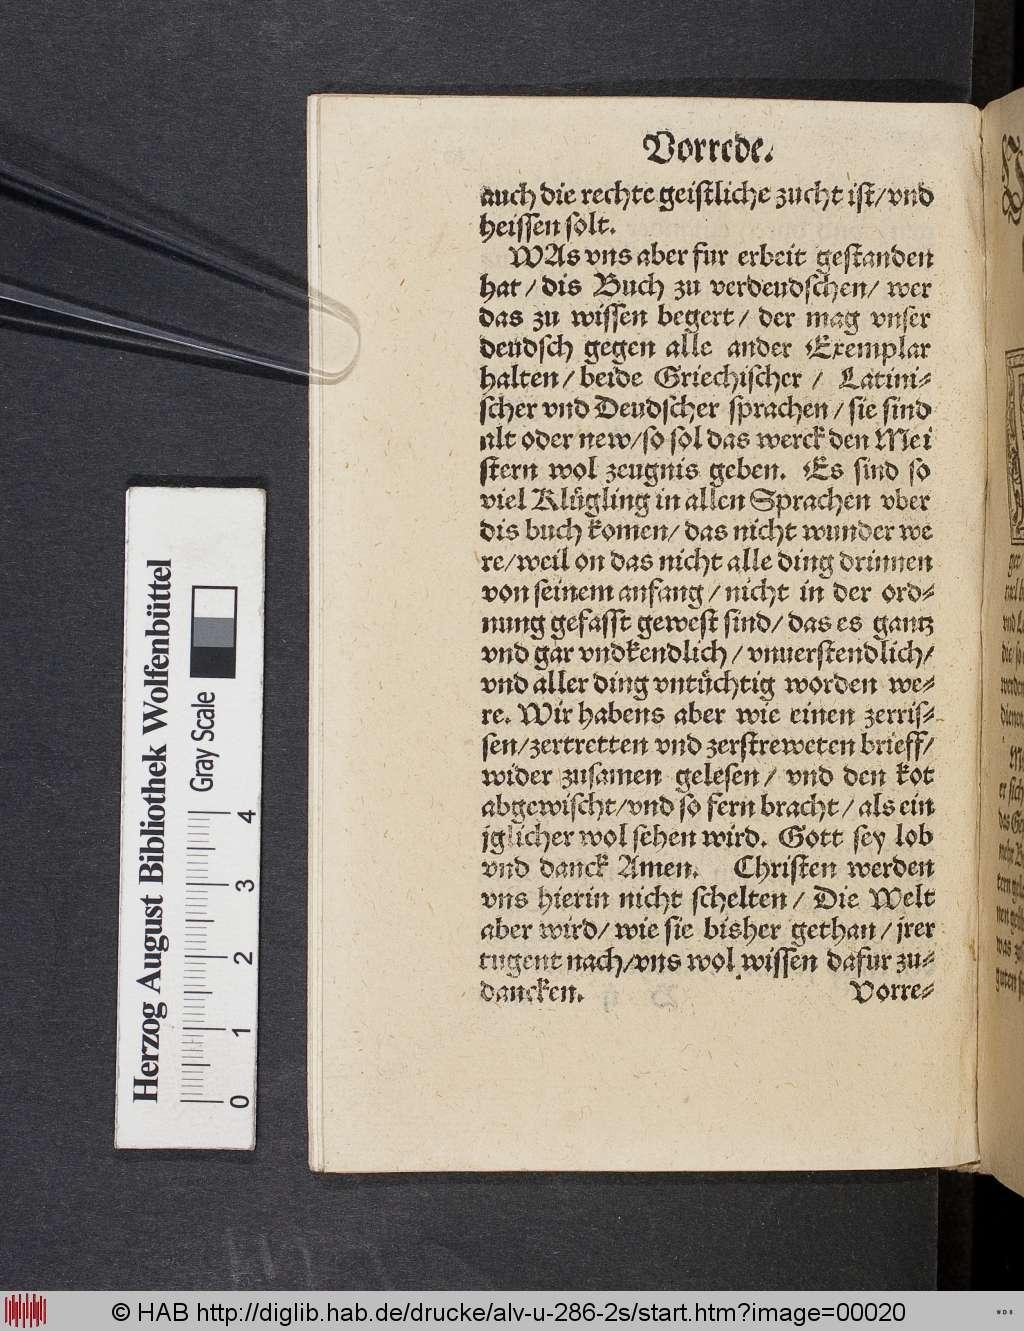 http://diglib.hab.de/drucke/alv-u-286-2s/00020.jpg